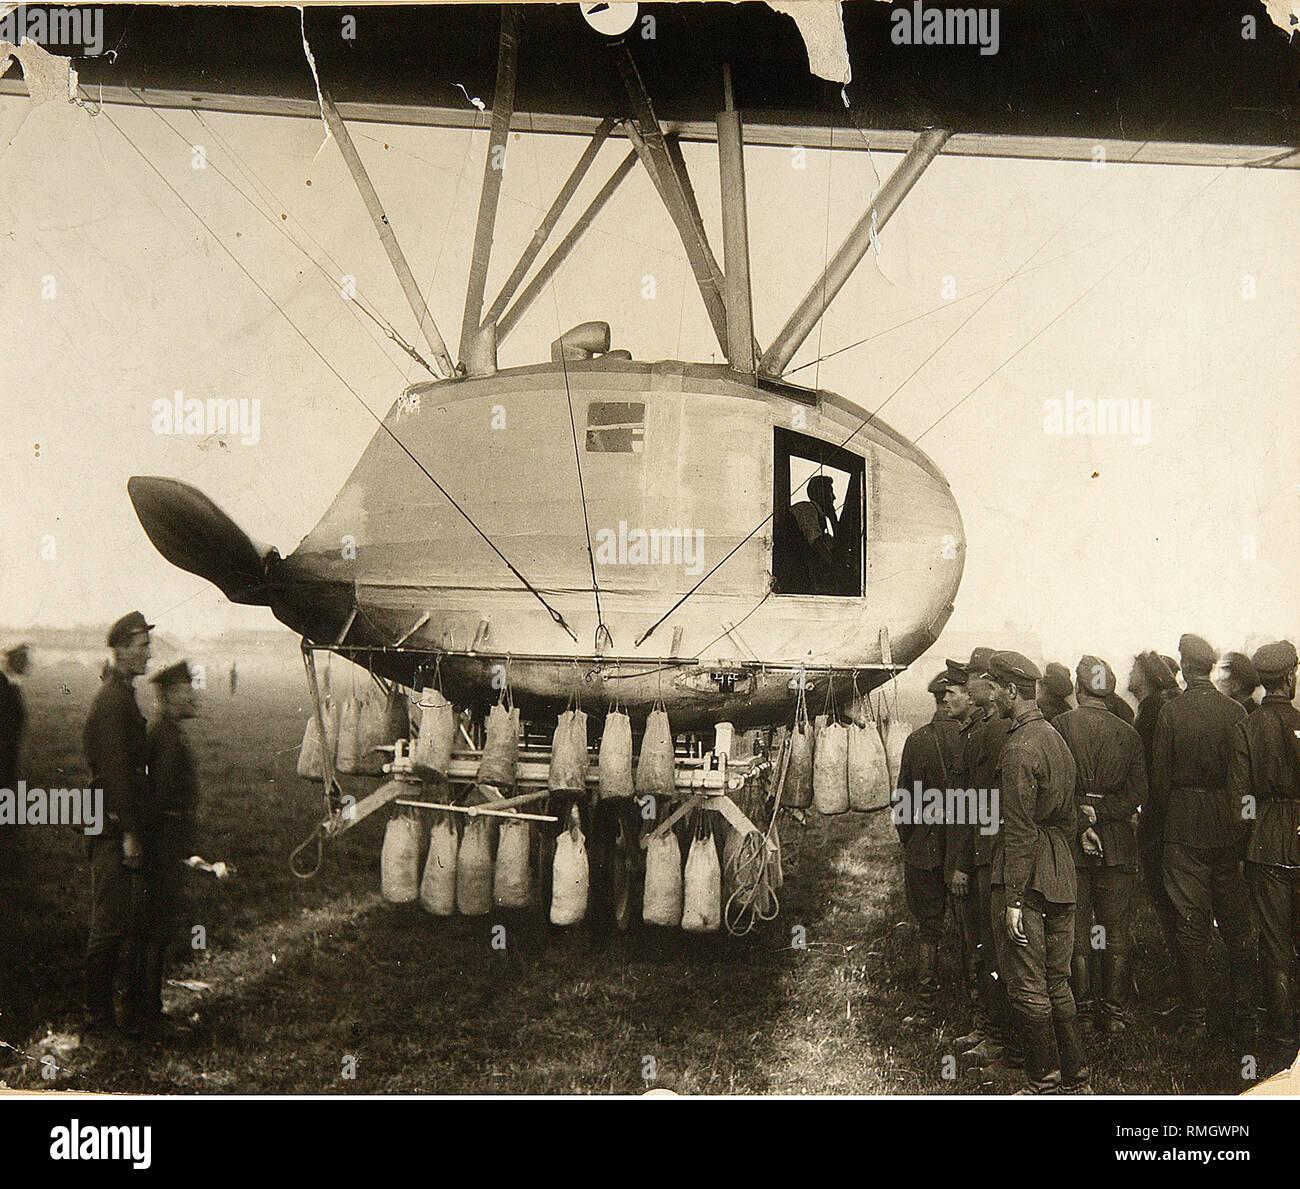 Aeronautic Machine. Photograph - Stock Image